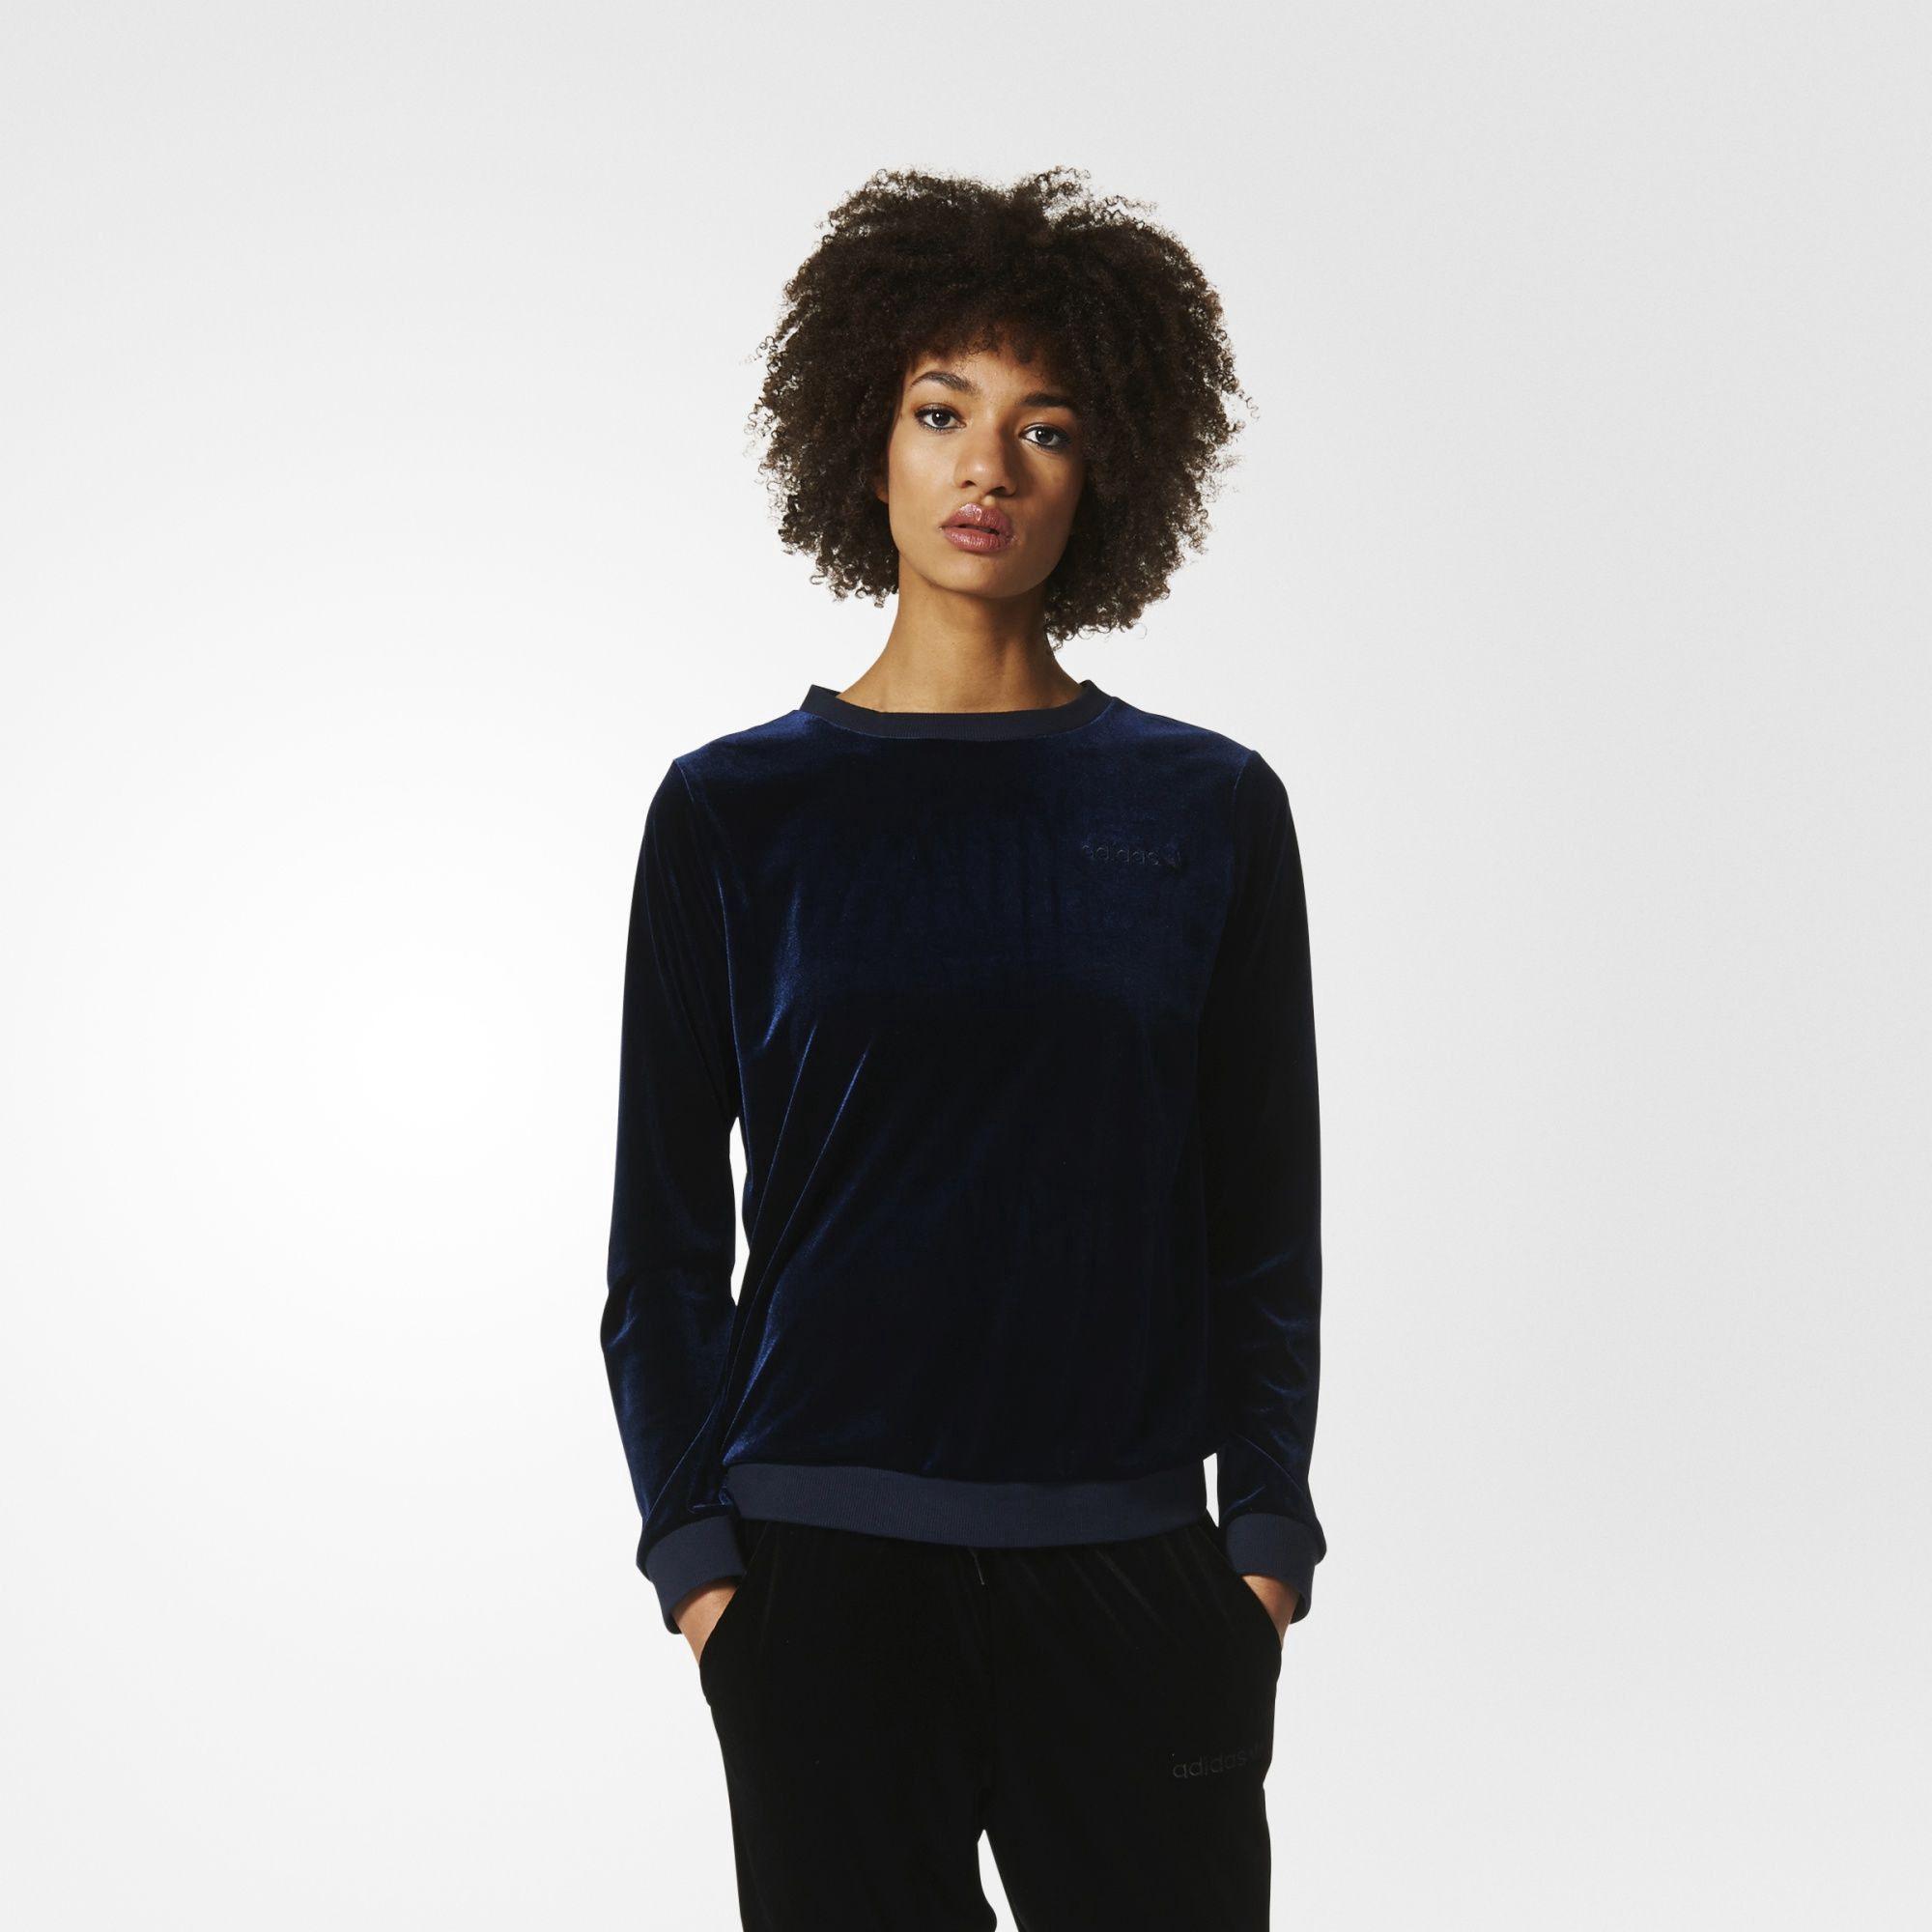 Adidas Originals Velvet Sweatshirt Adidasoriginals